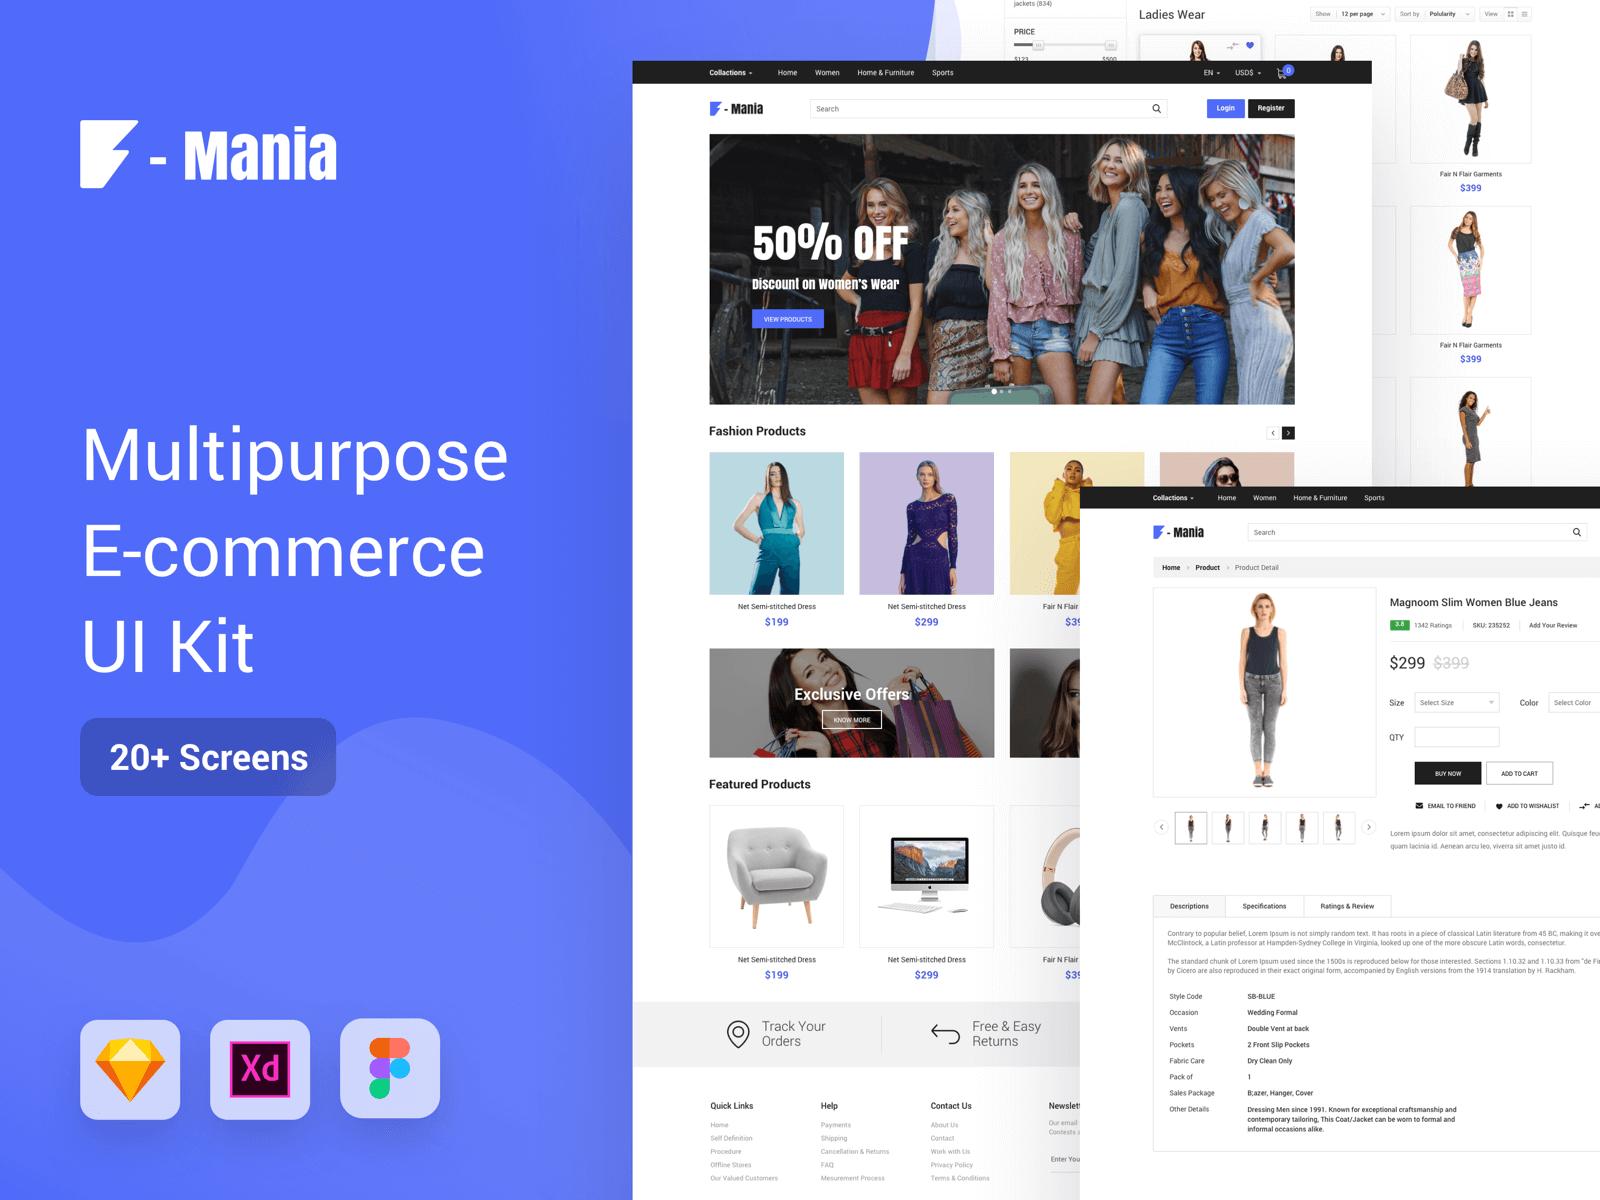 Multipurpose E-Commerce UI Kit